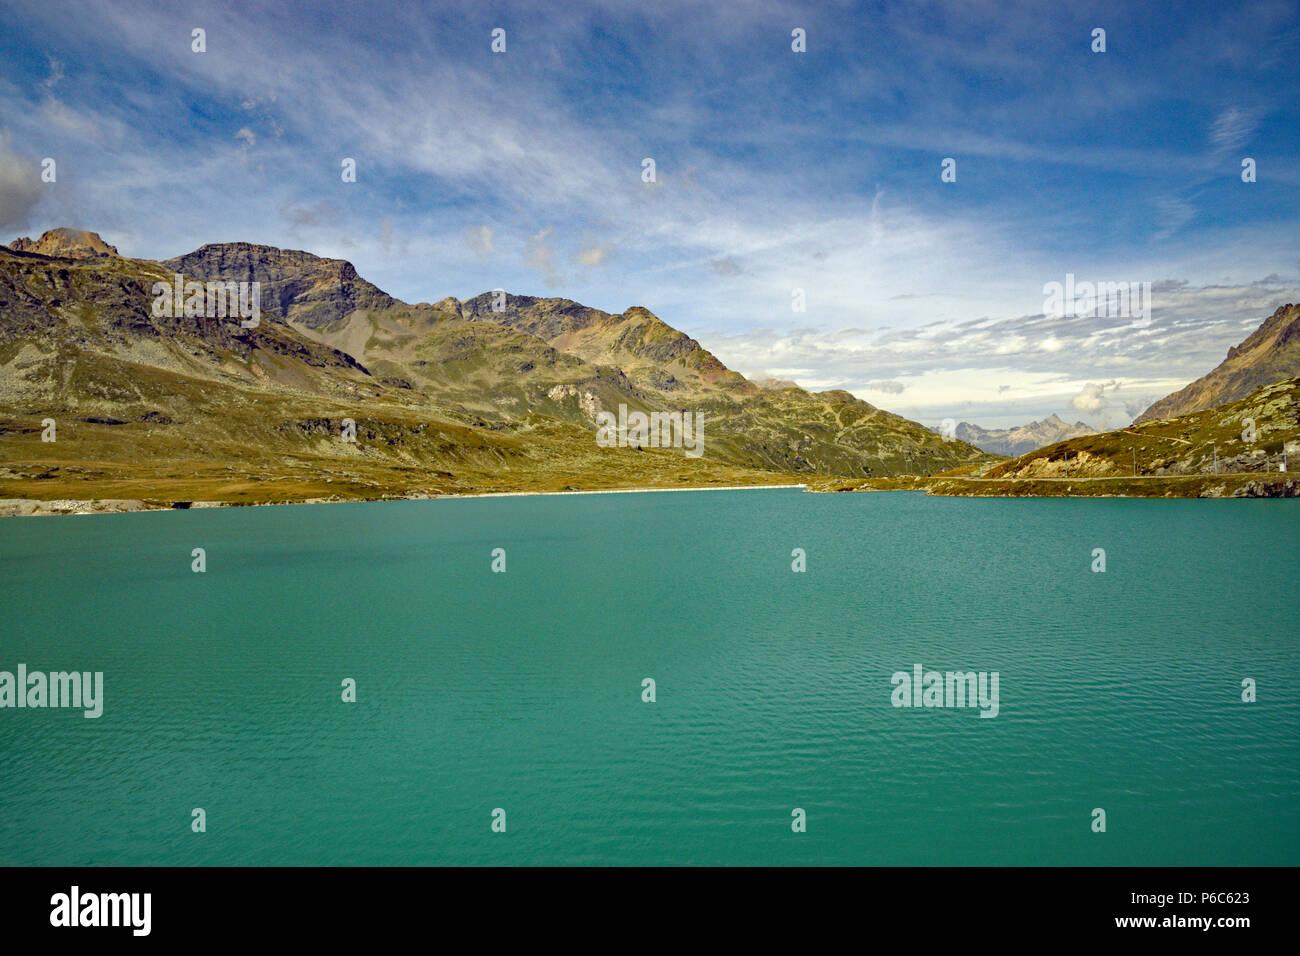 Glacier green lake in Switzerland - Stock Image